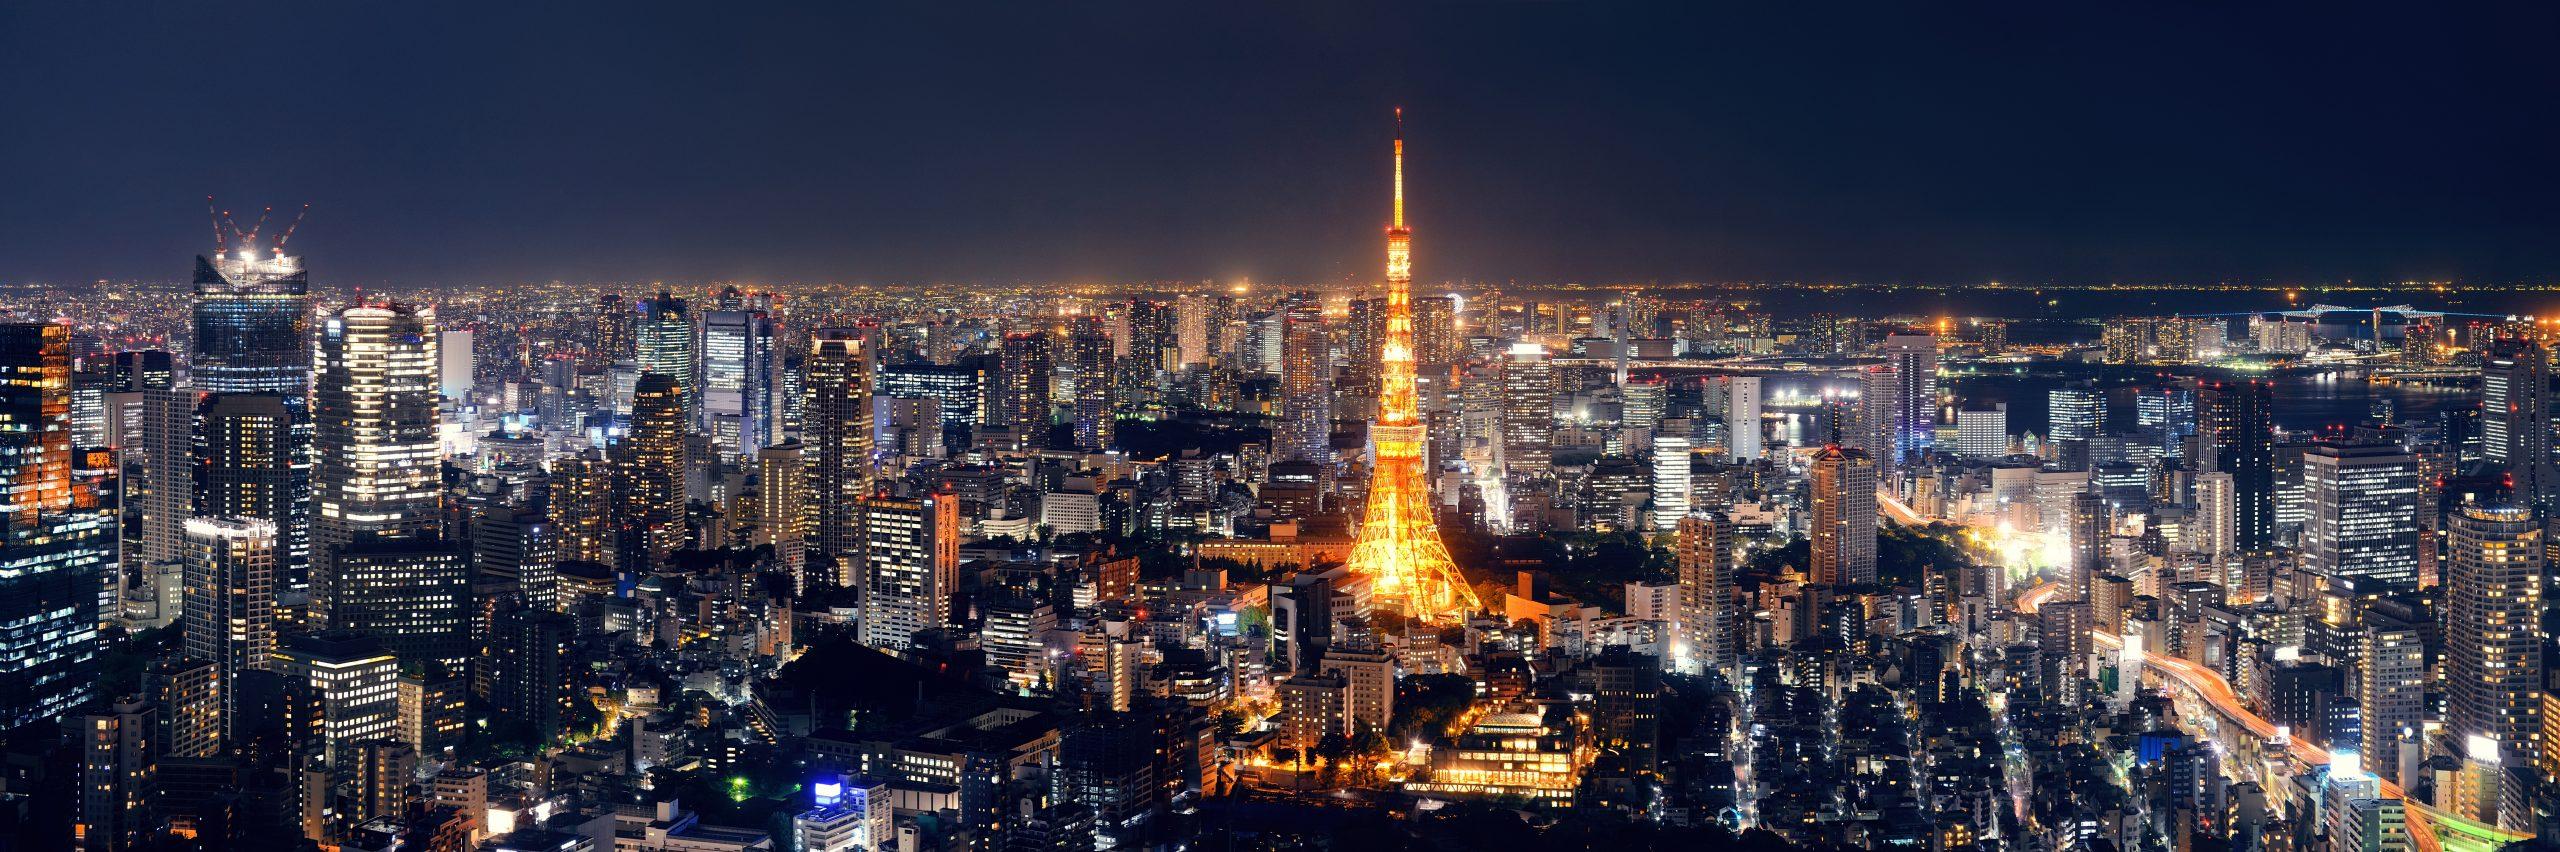 JAPAN Illegal